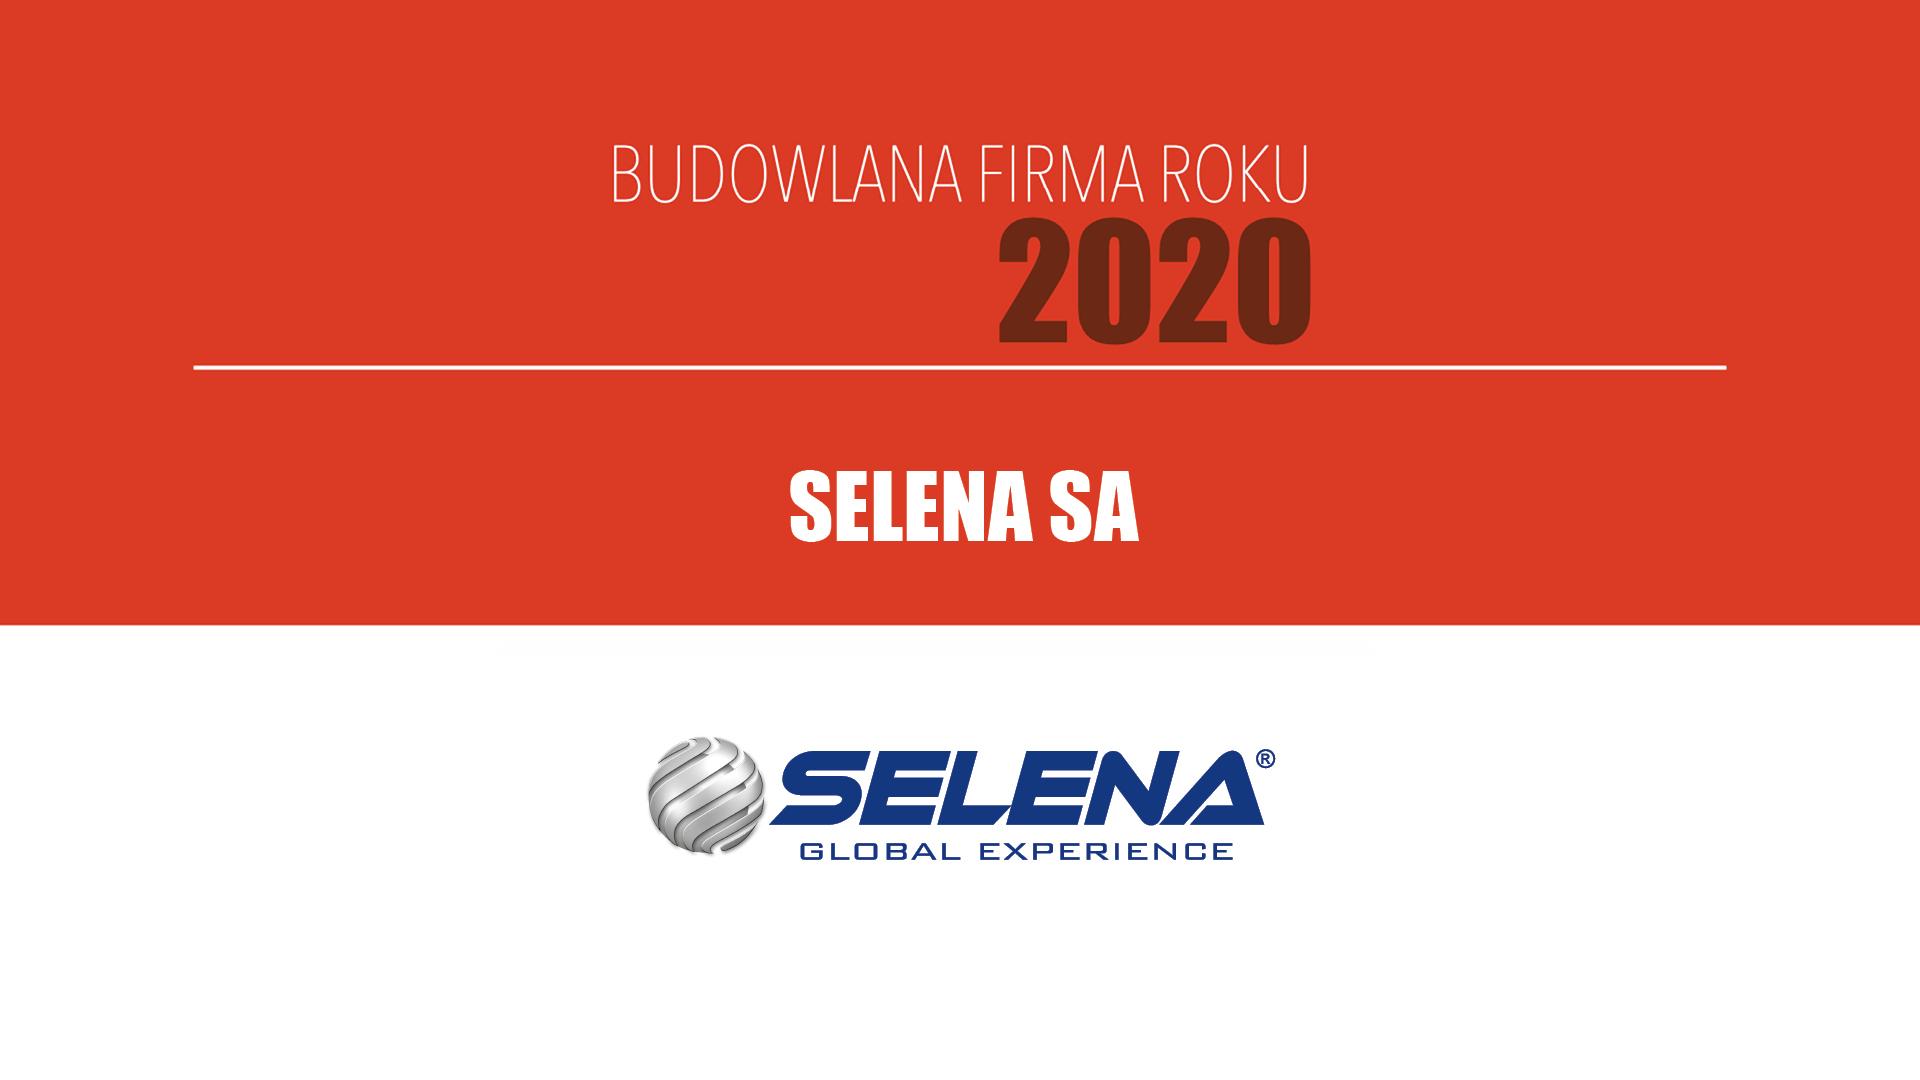 SELENA SA – Budowlana Firma Roku 2020